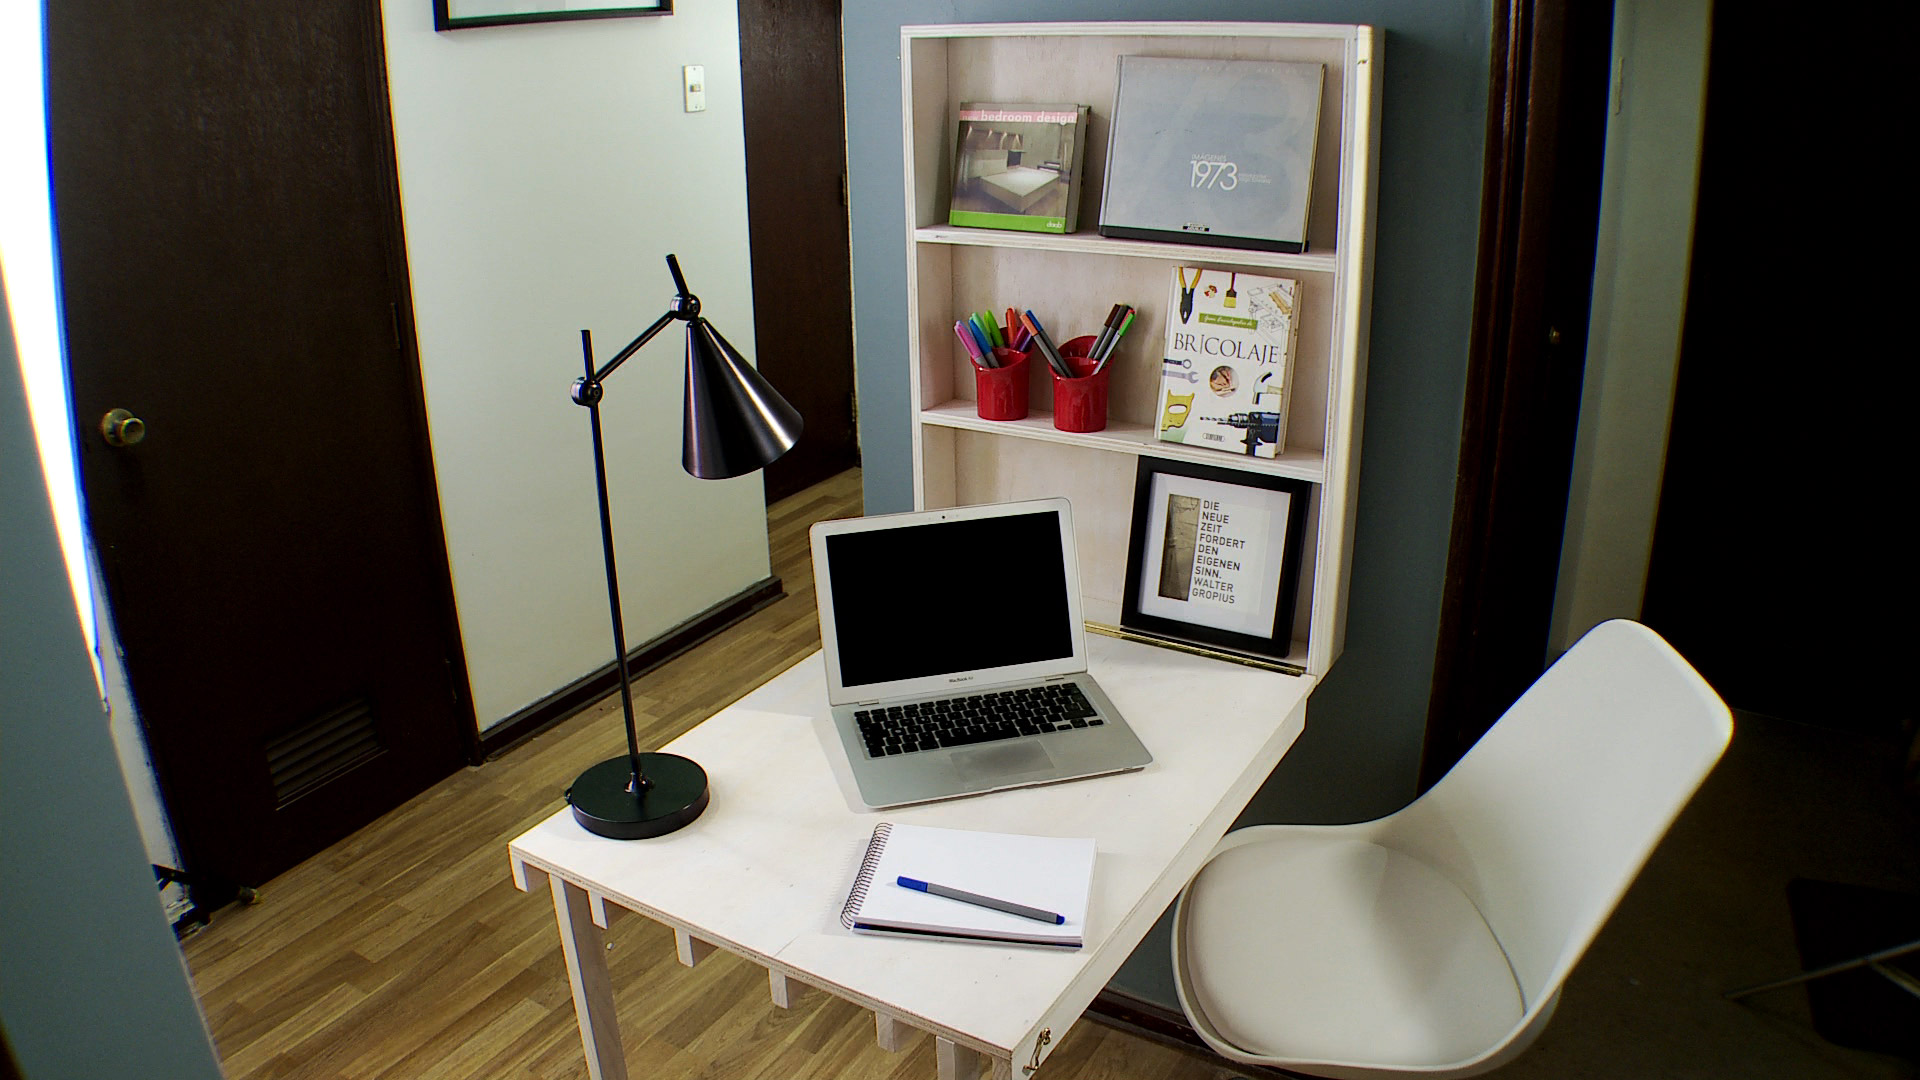 H galo usted mismo c mo construir un escritorio con - Mesa de escritorio plegable ...